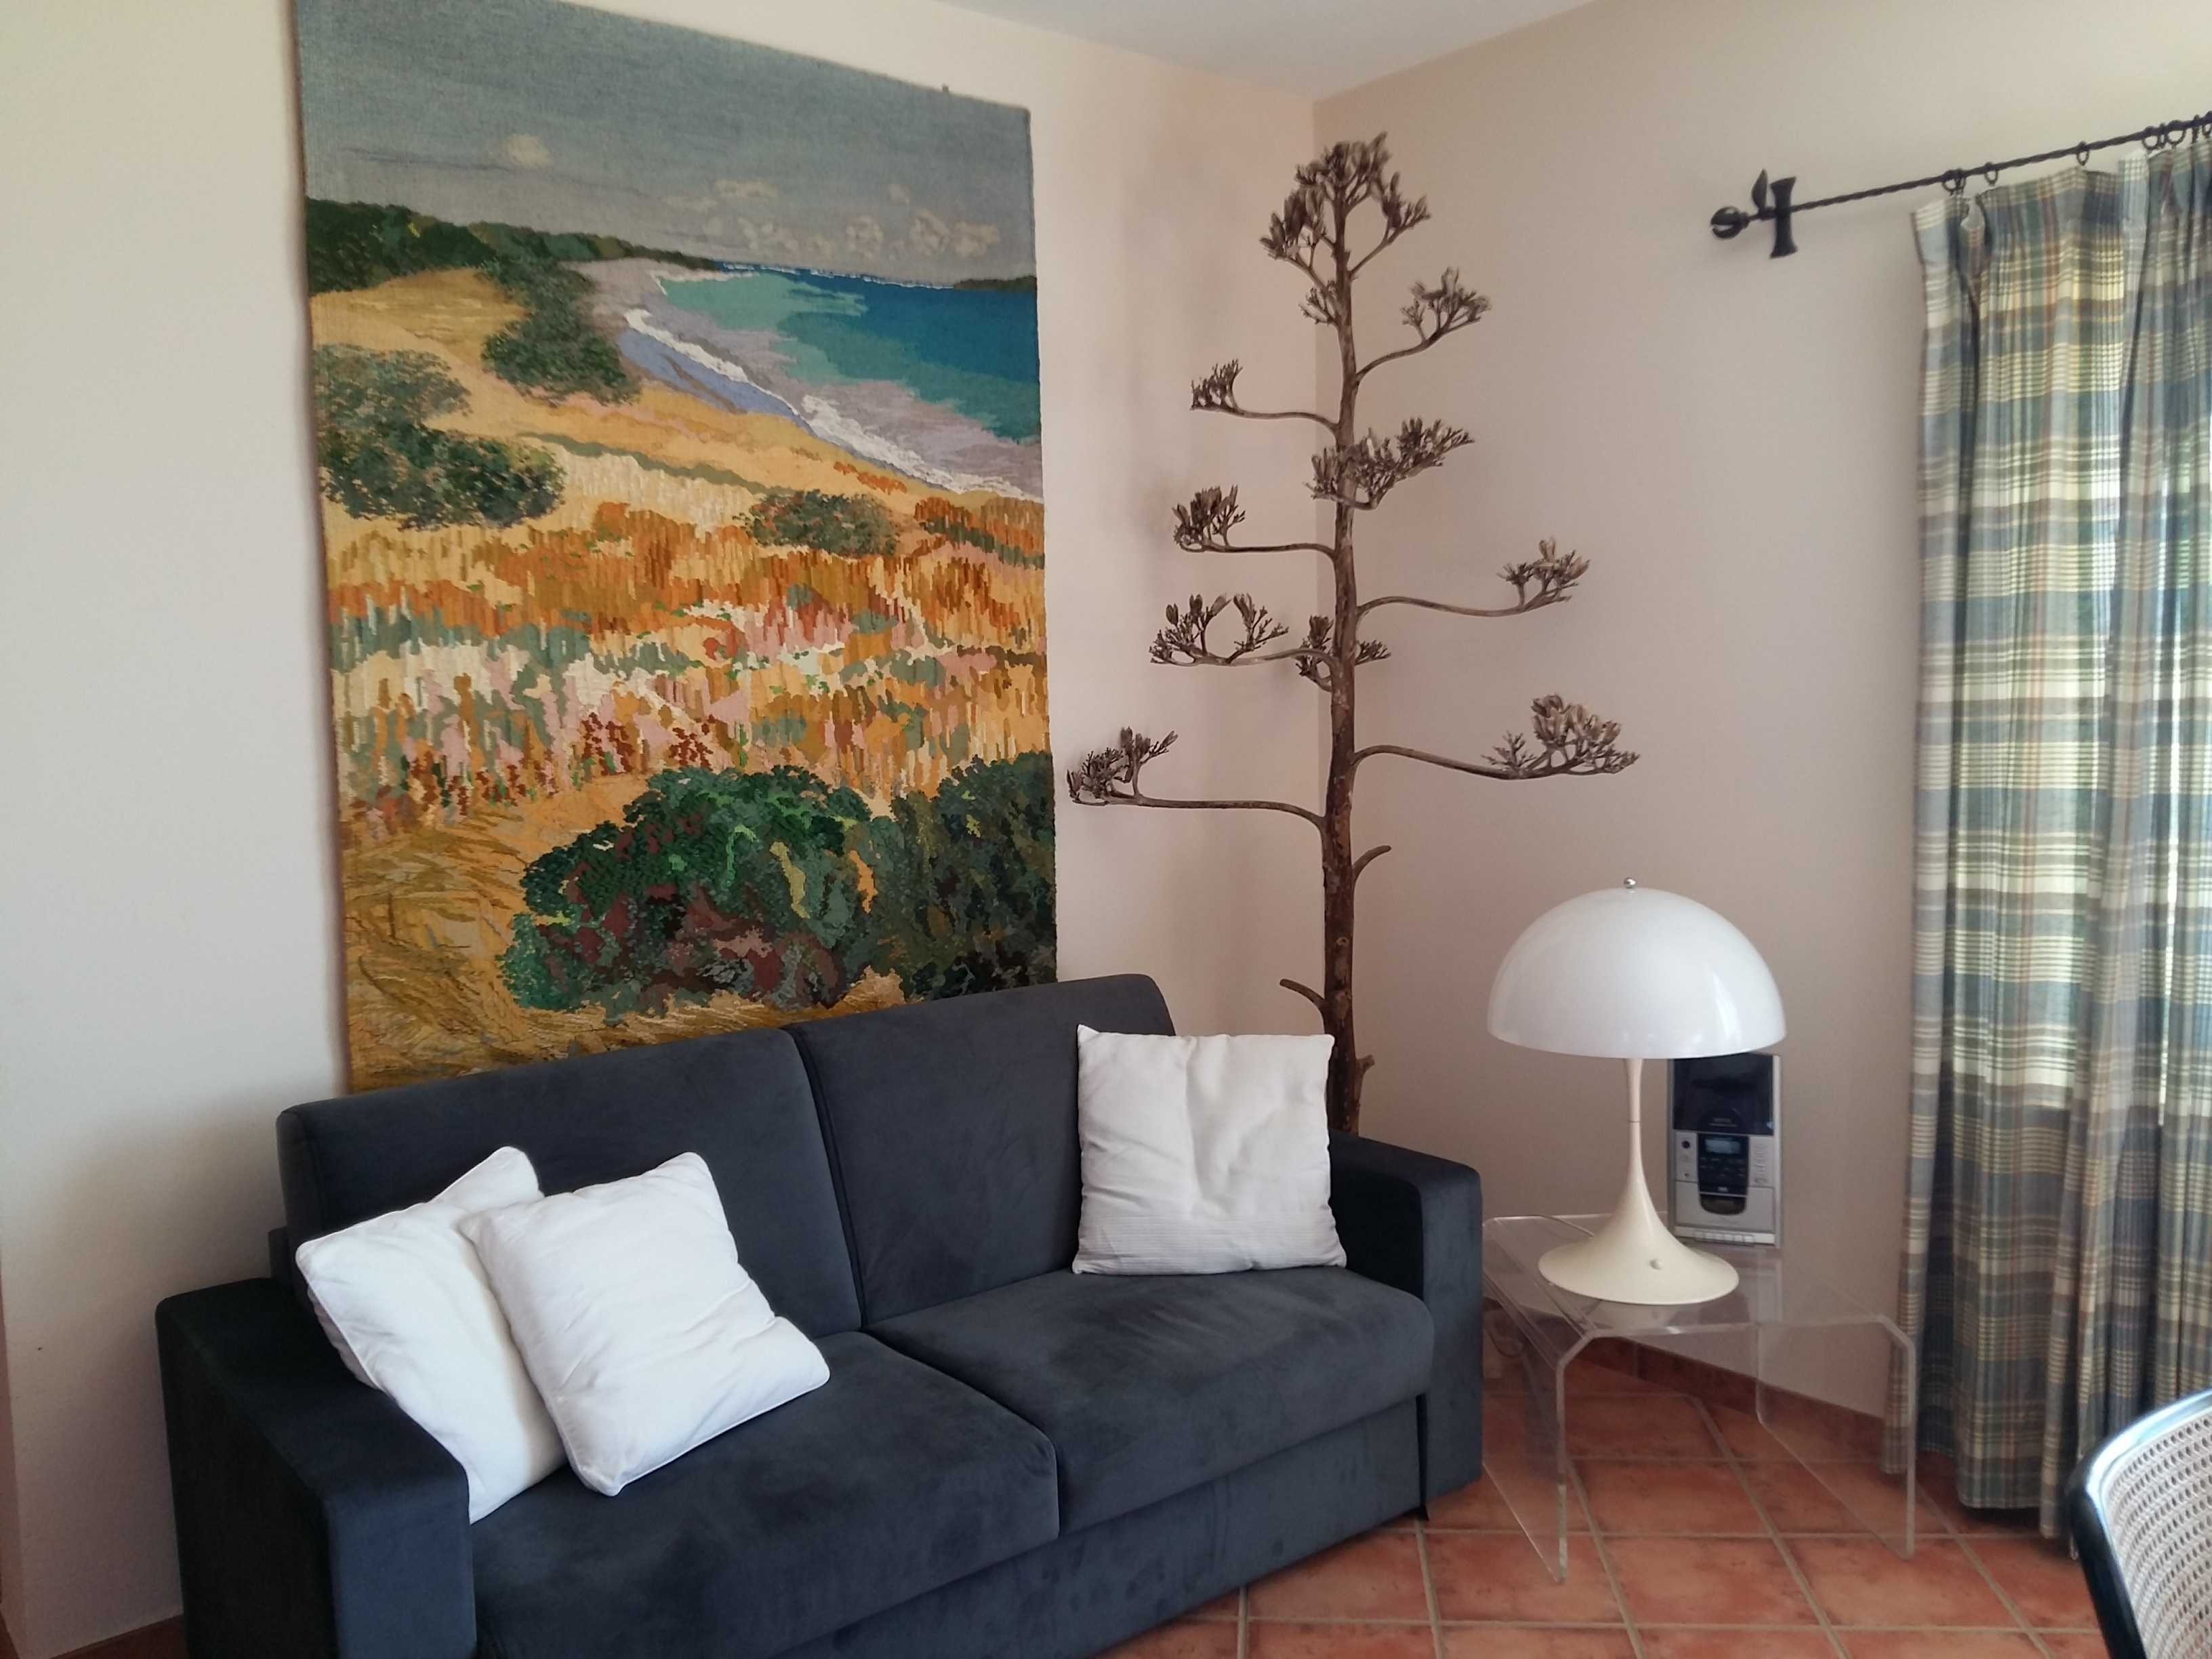 Korfu Ferienwohnung Flora, Acharavi, Korfu, Griechenland, KorfuCorfu.de